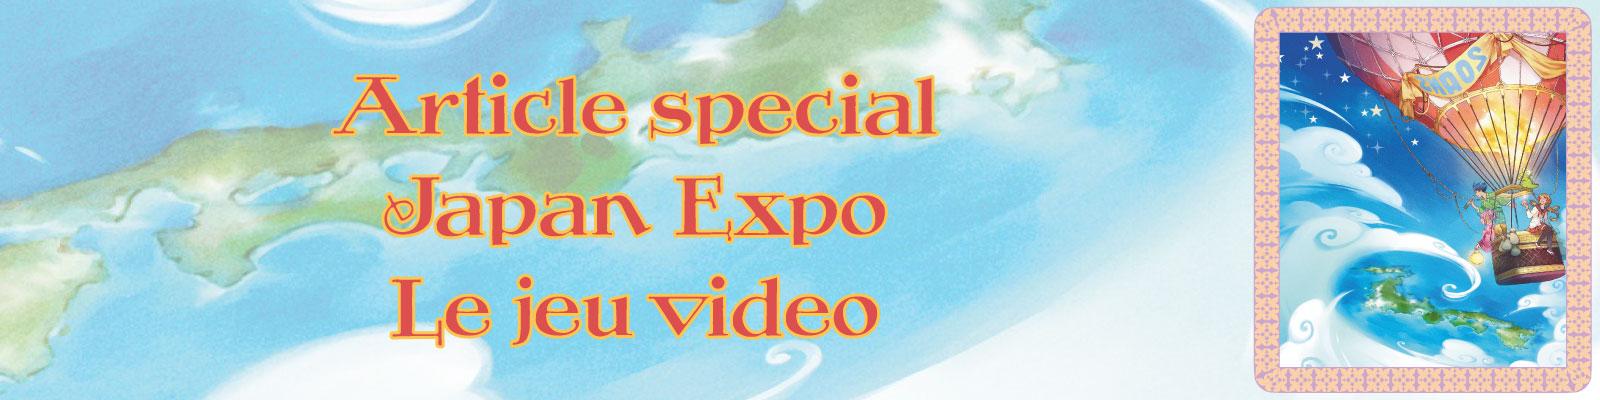 Japan-Expo-Jeu vidéo